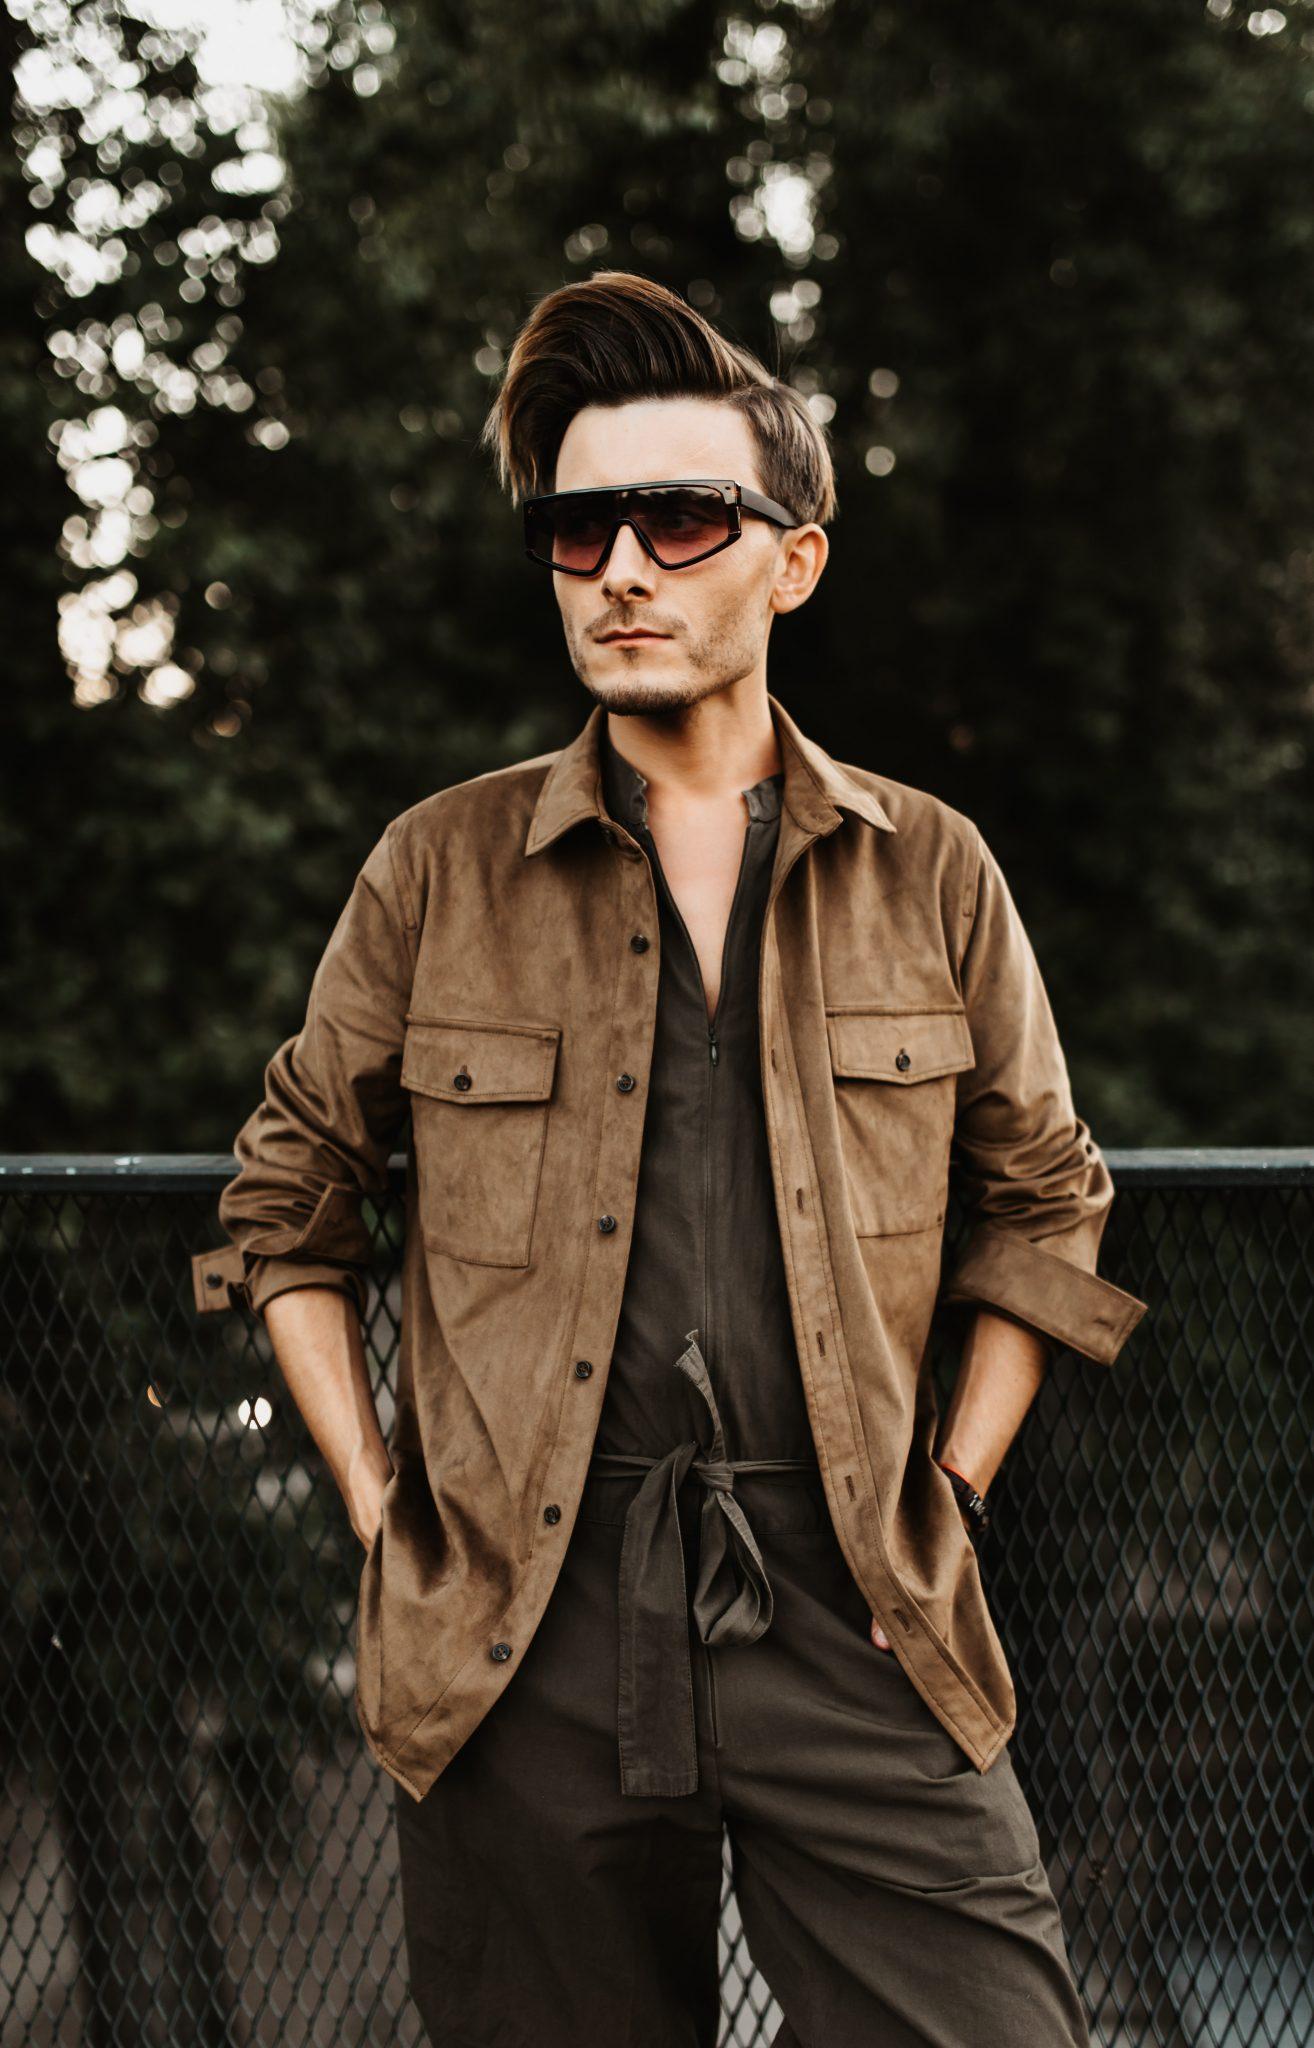 men-styel-men-fashion-bloger-modowy-moda